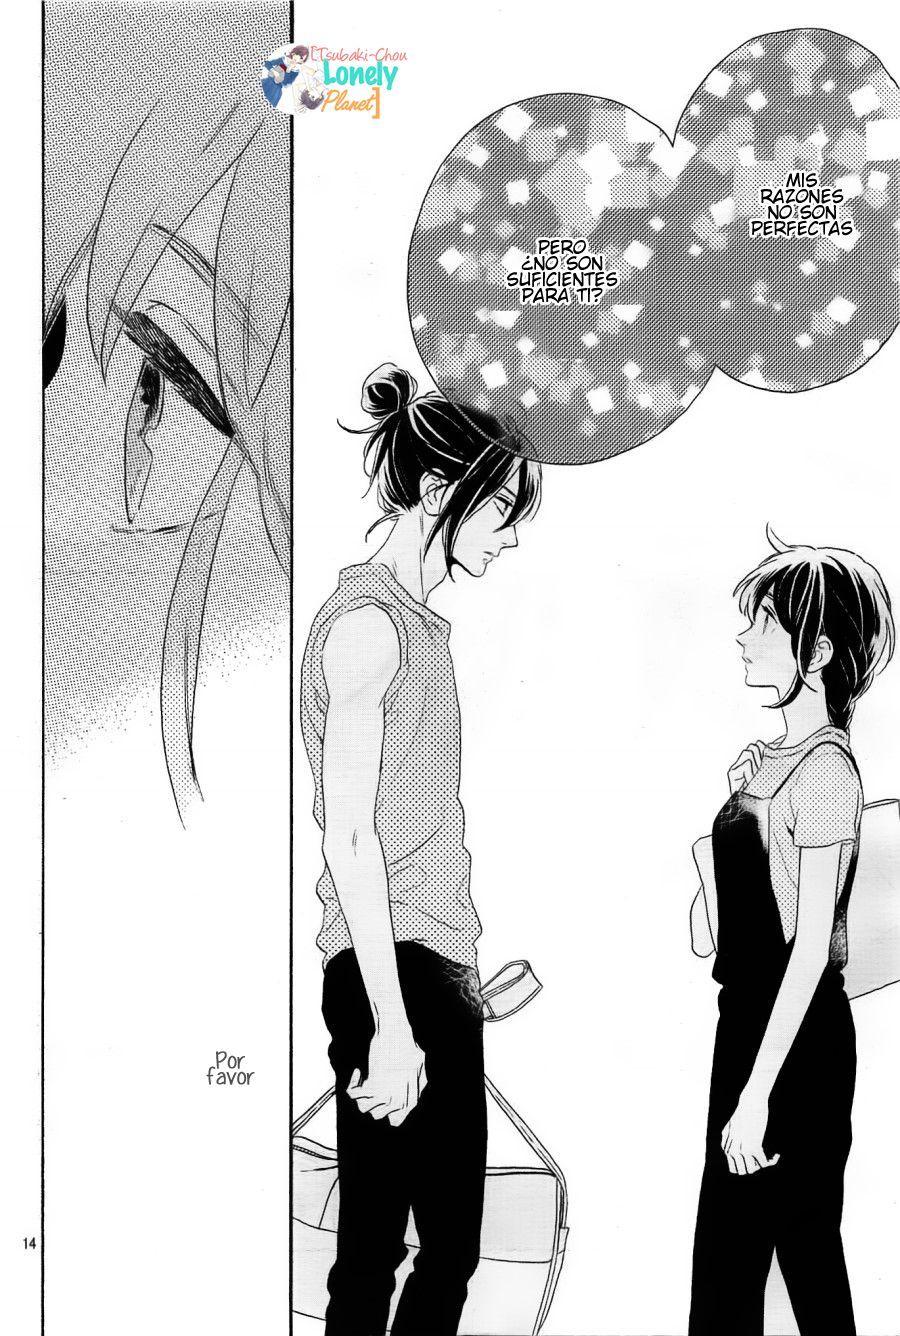 Tsubaki Chou Lonely Planet : tsubaki, lonely, planet, Tsubaki, Lonely, Planet, Manga,, Shoujo, Anime